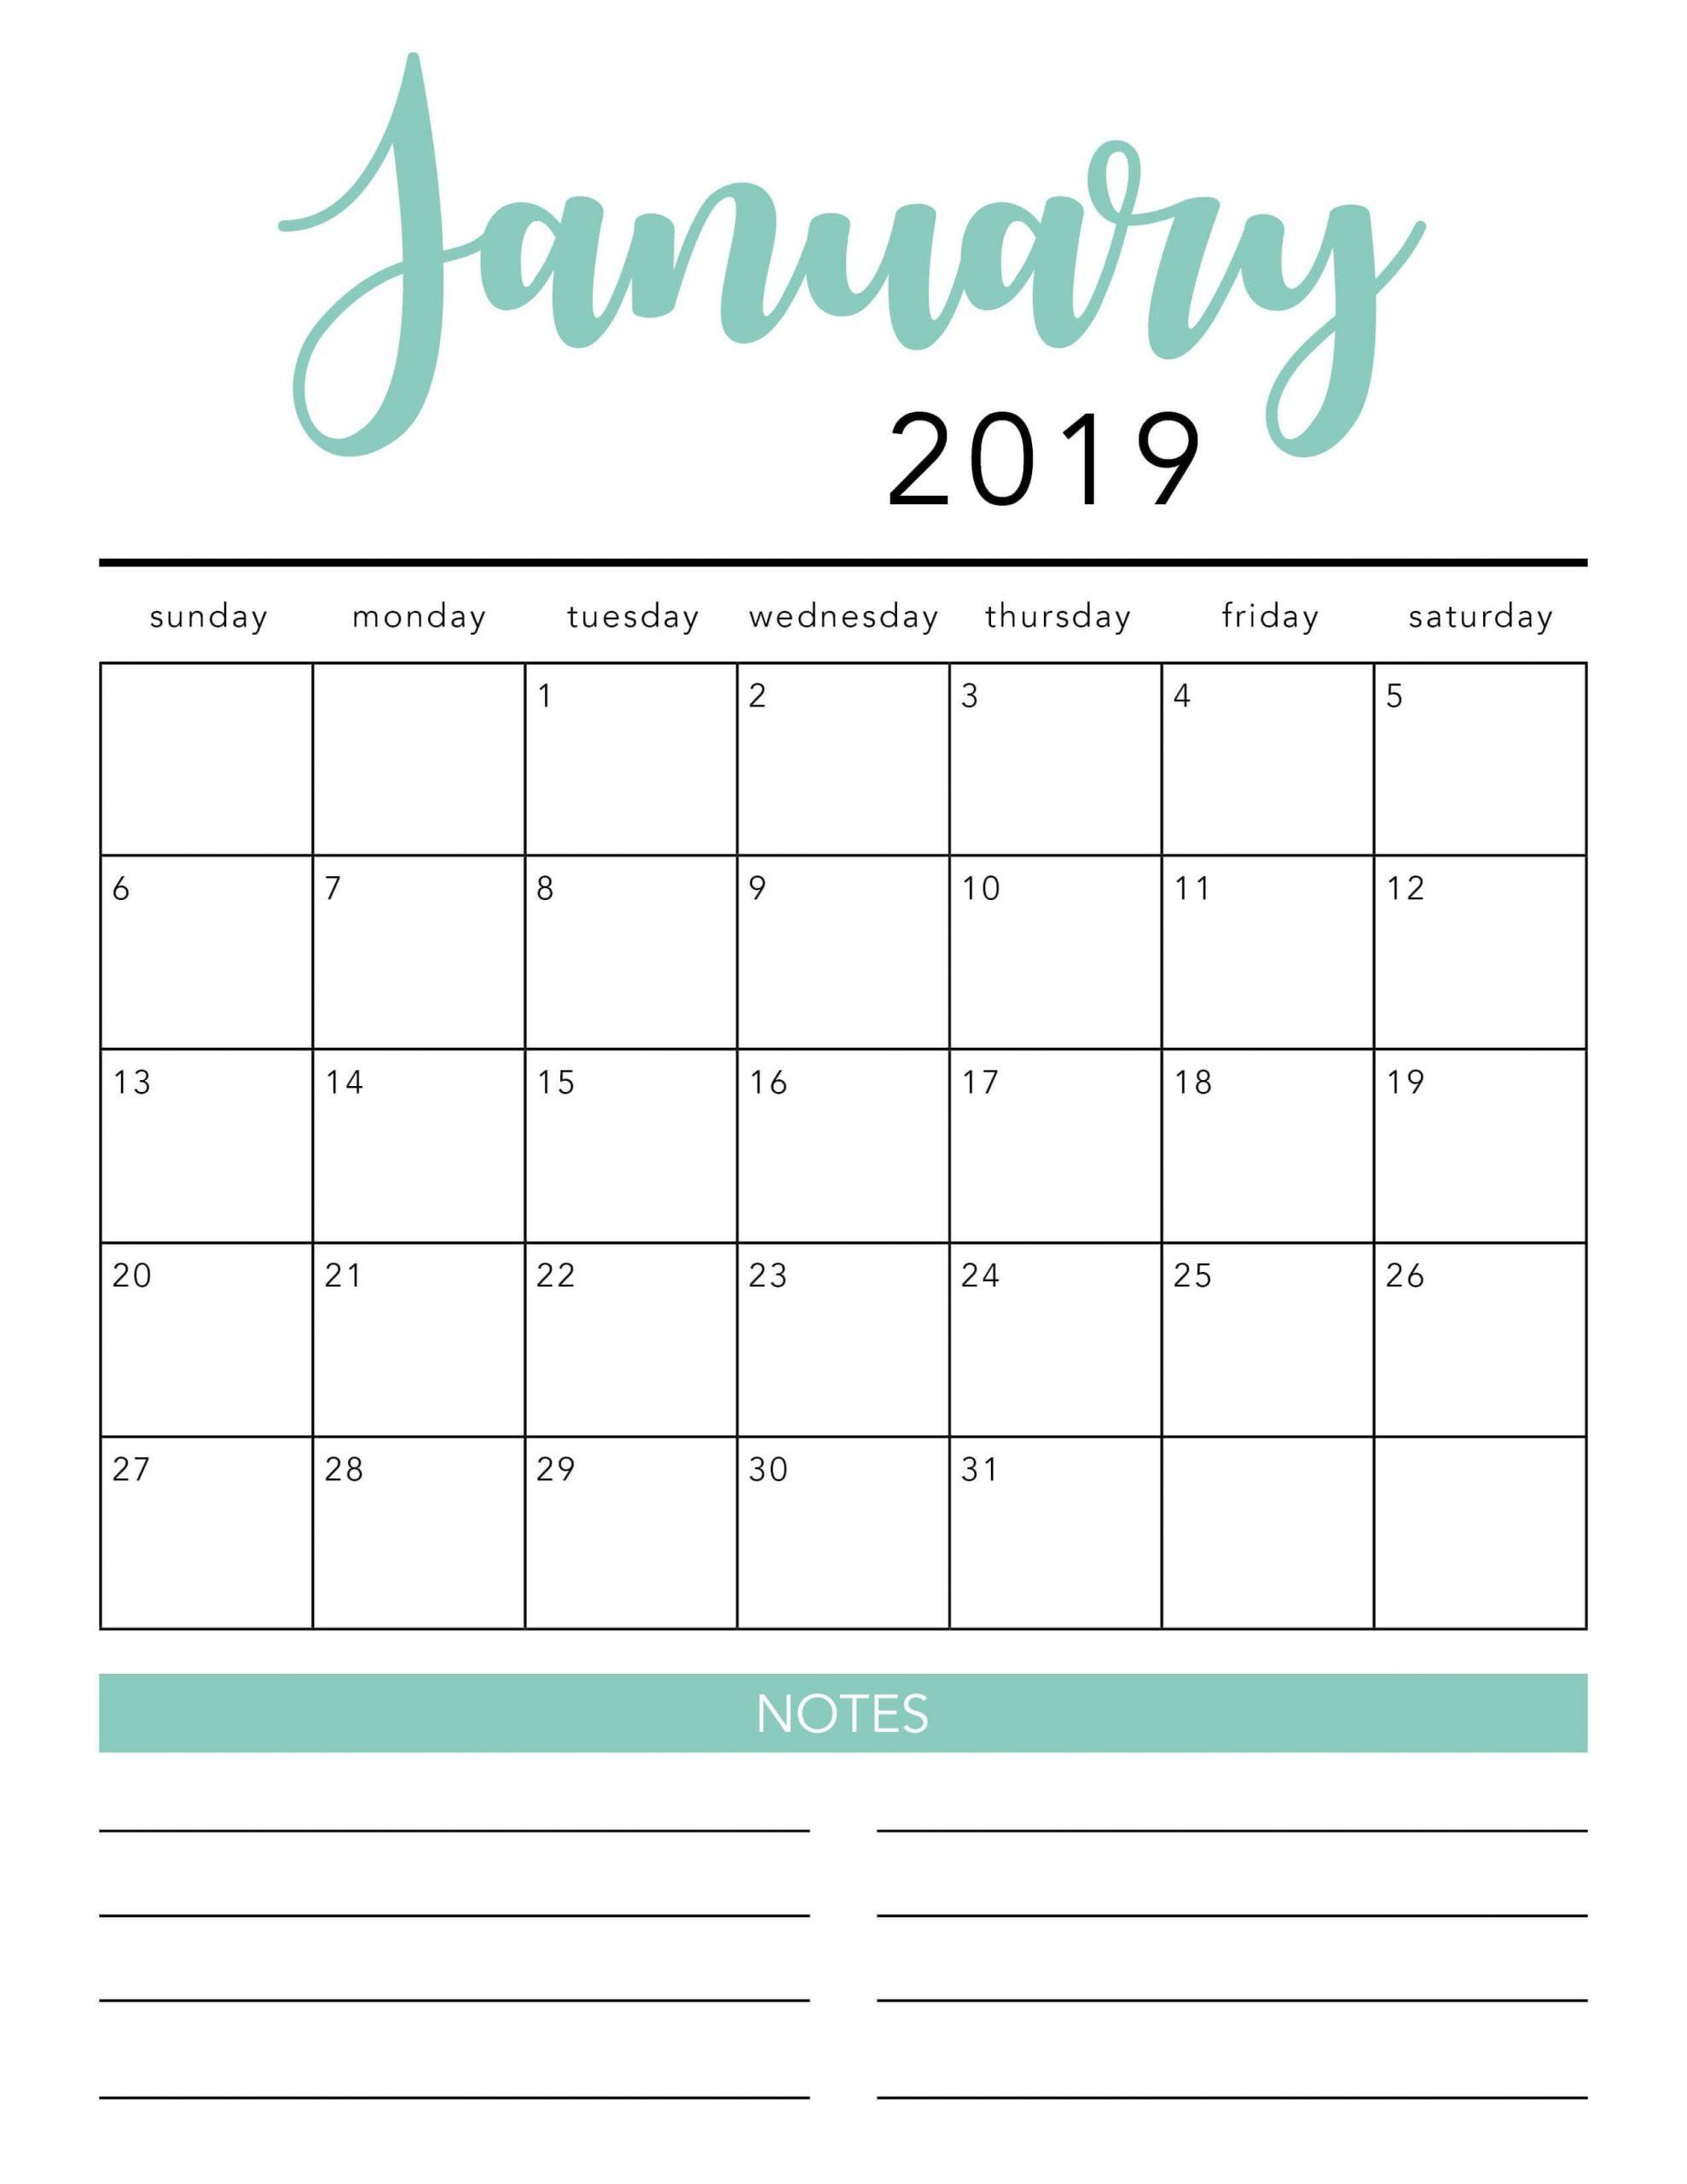 Free 2020 Printable Calendar Template (2 Colors!) - I 3 Month Calendar Printable Free